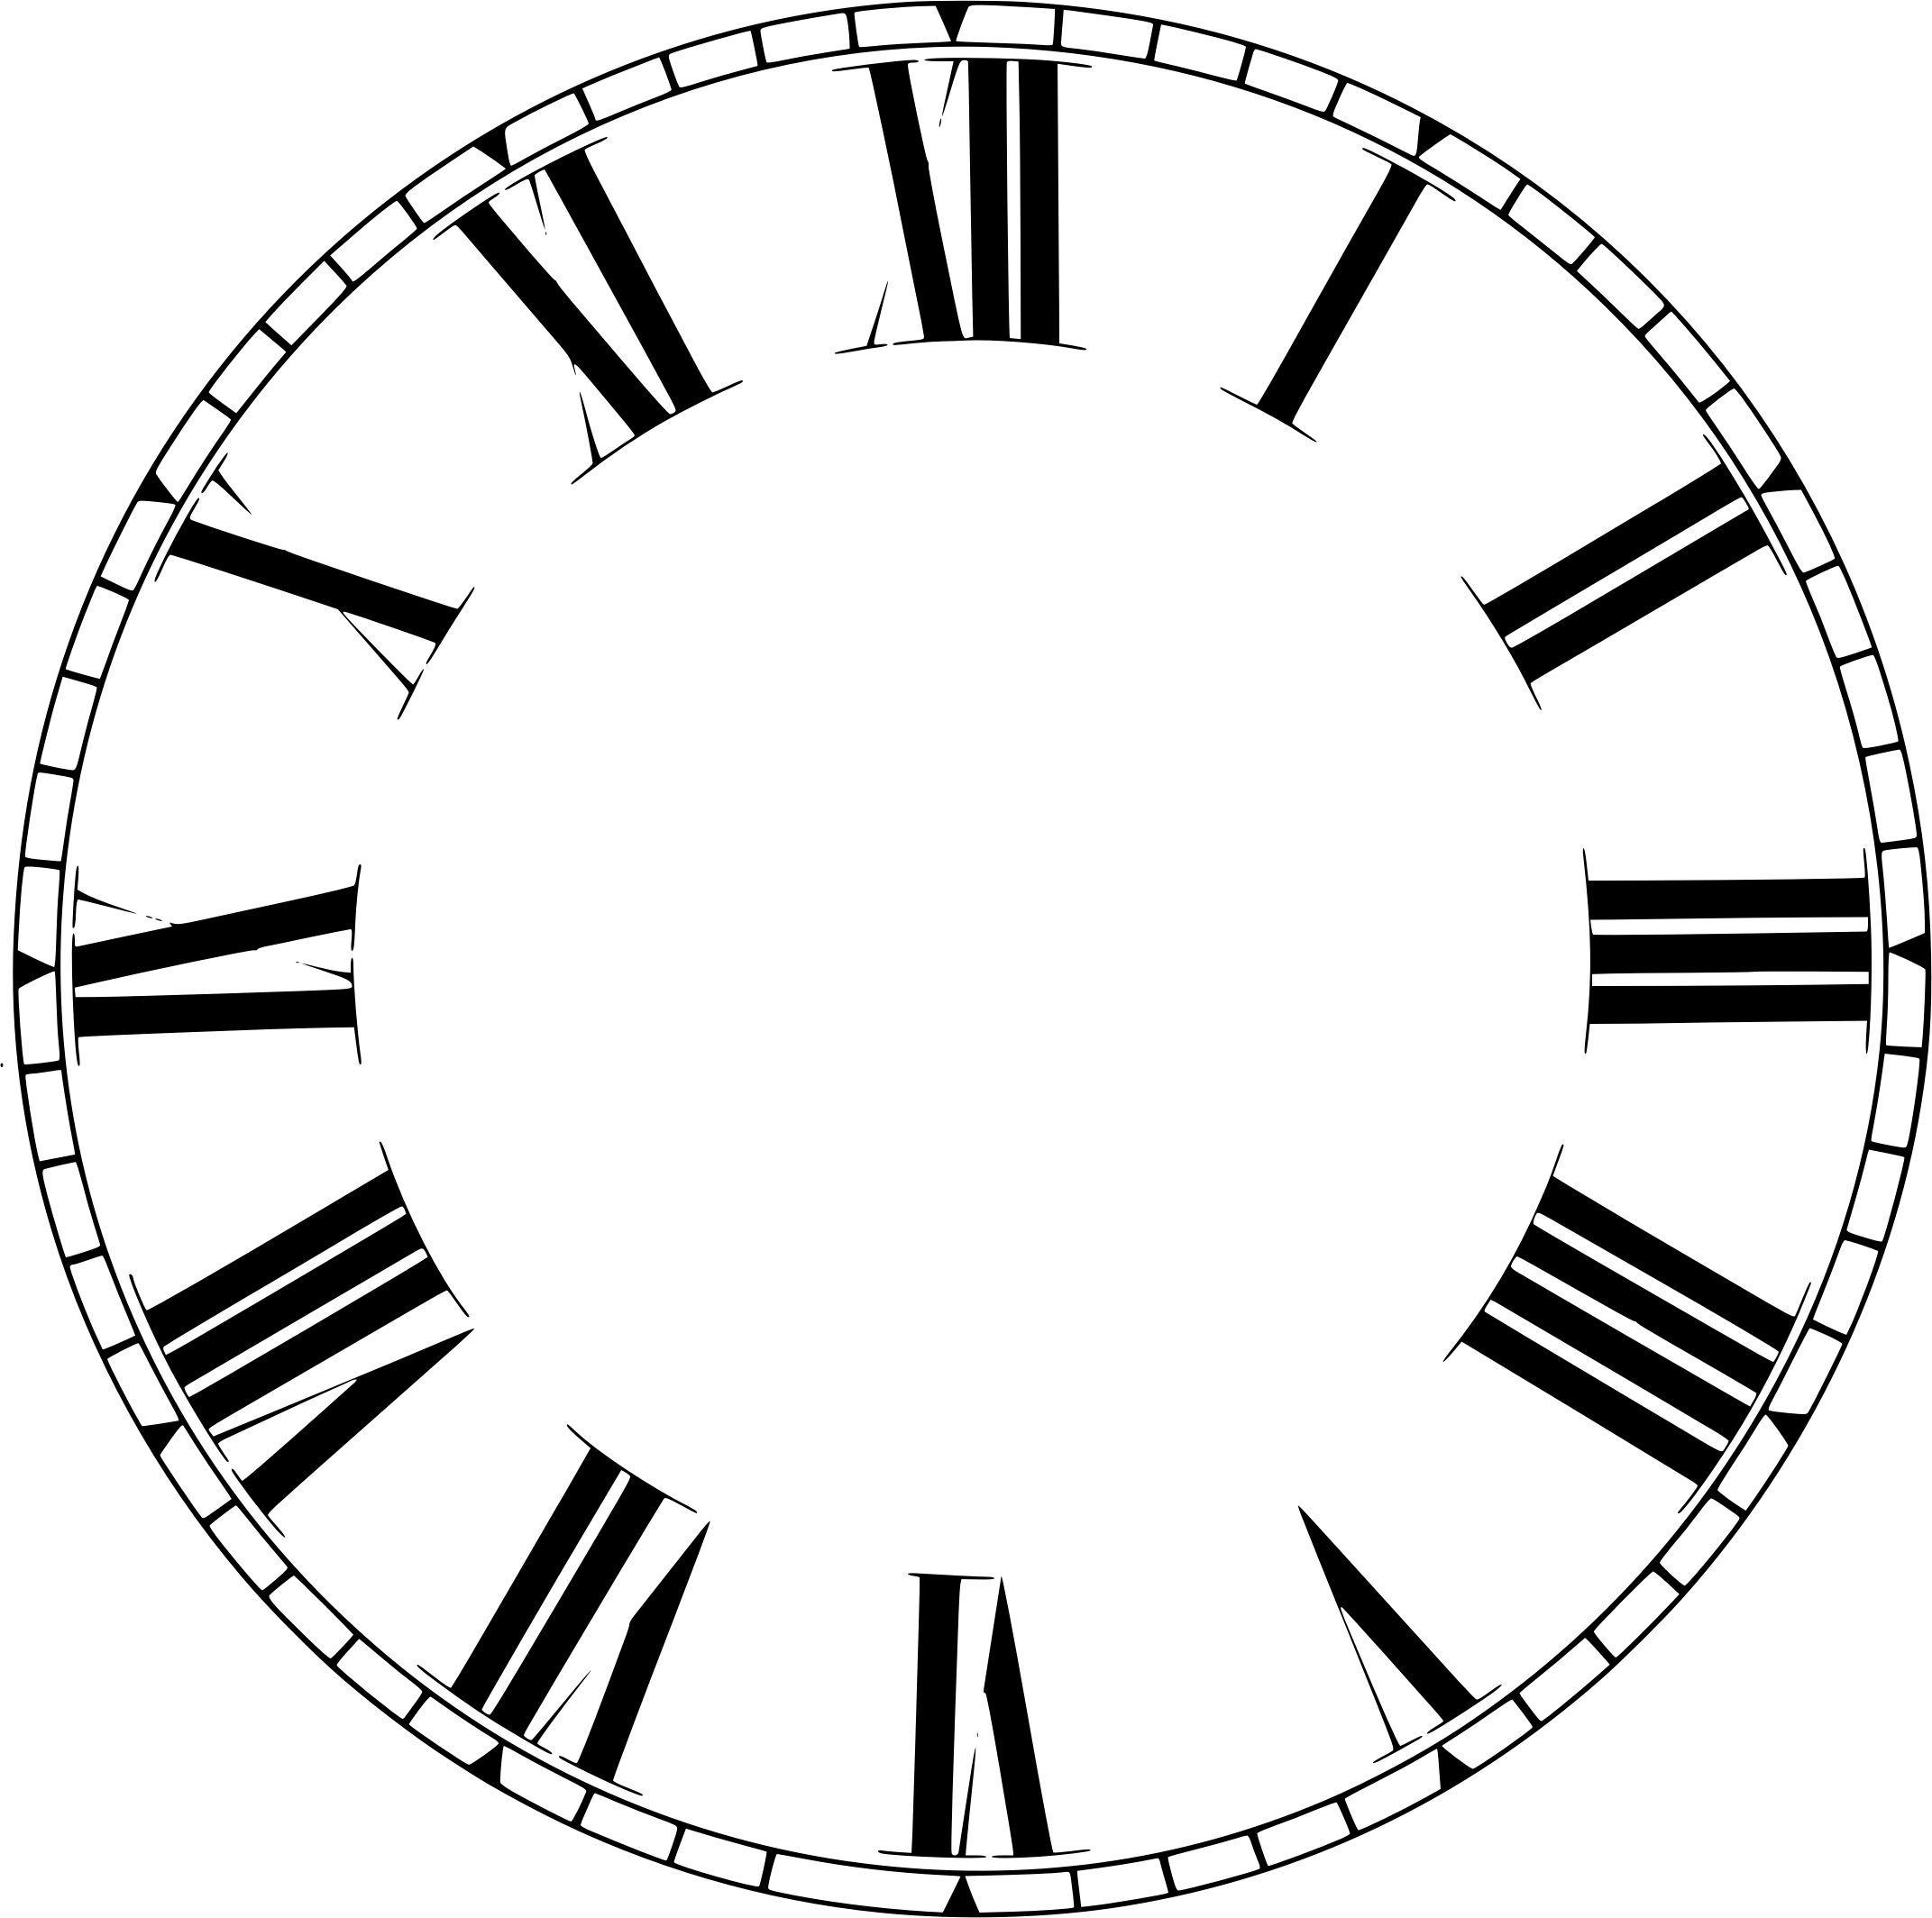 Clock background by BilgehanKorkmaz: https://openclipart.org/detail/232705/clock-background